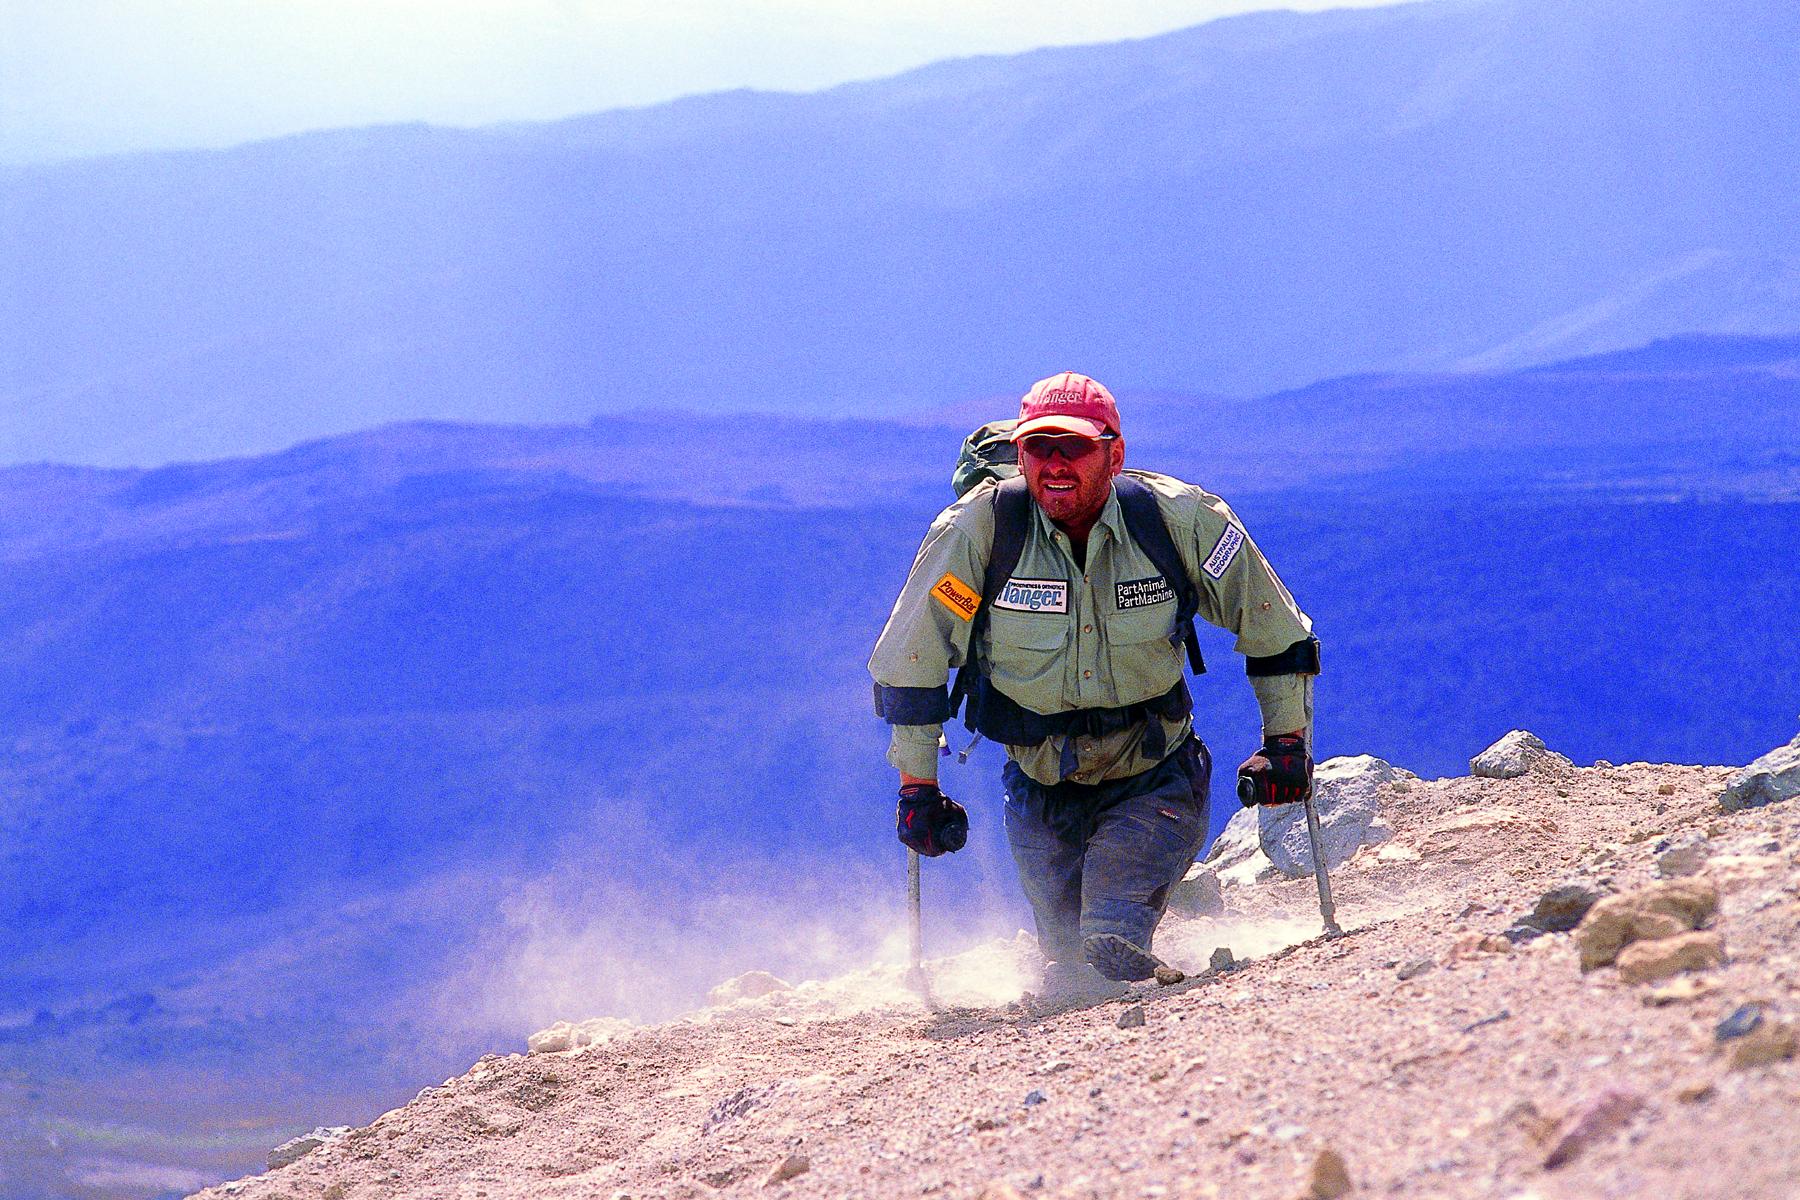 Warren Macdonald,Mount Kilimanjaro (3.4 MB)